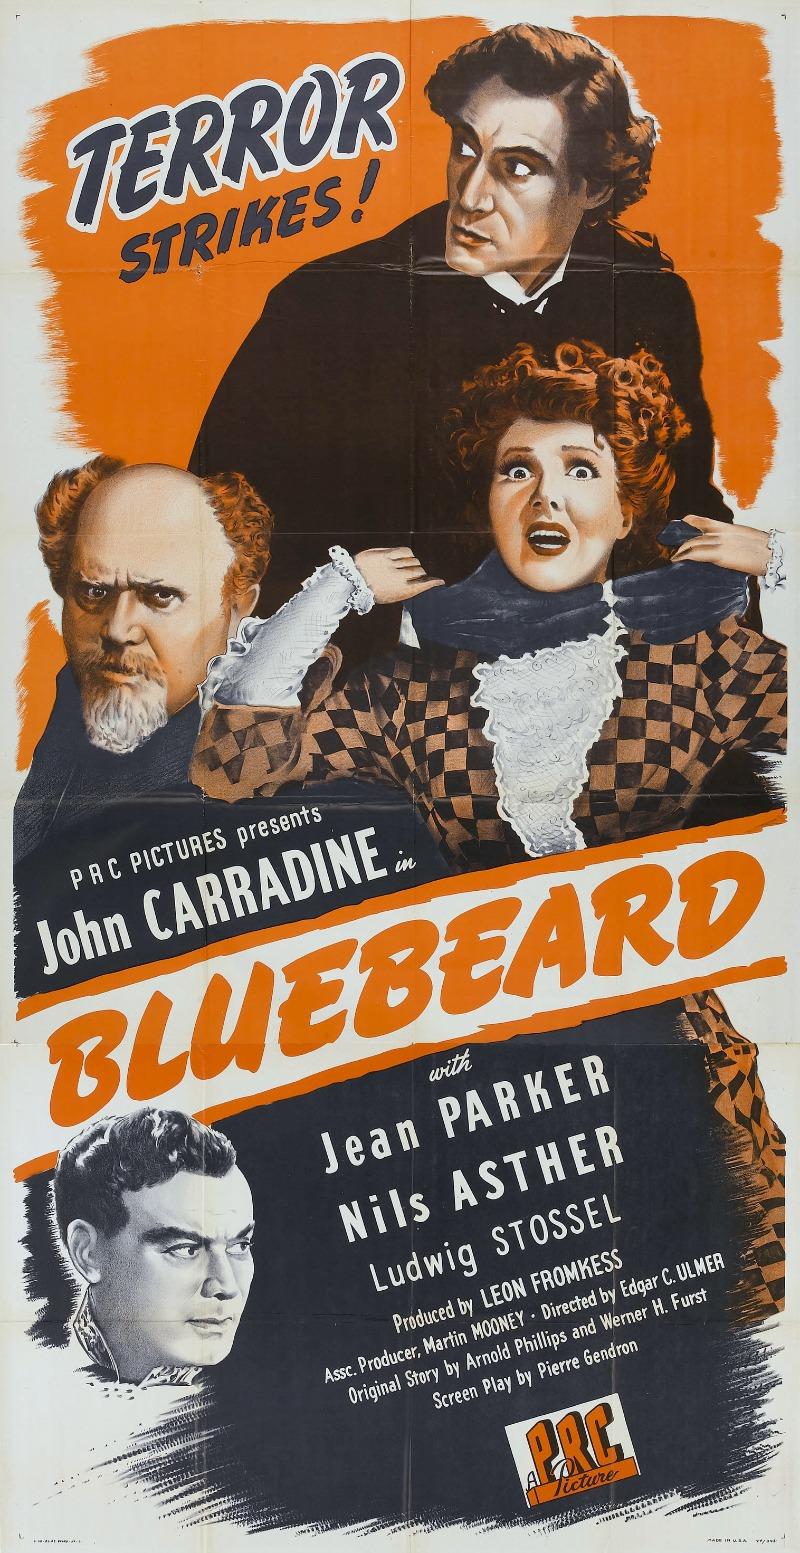 bluebeard poster 2 blog